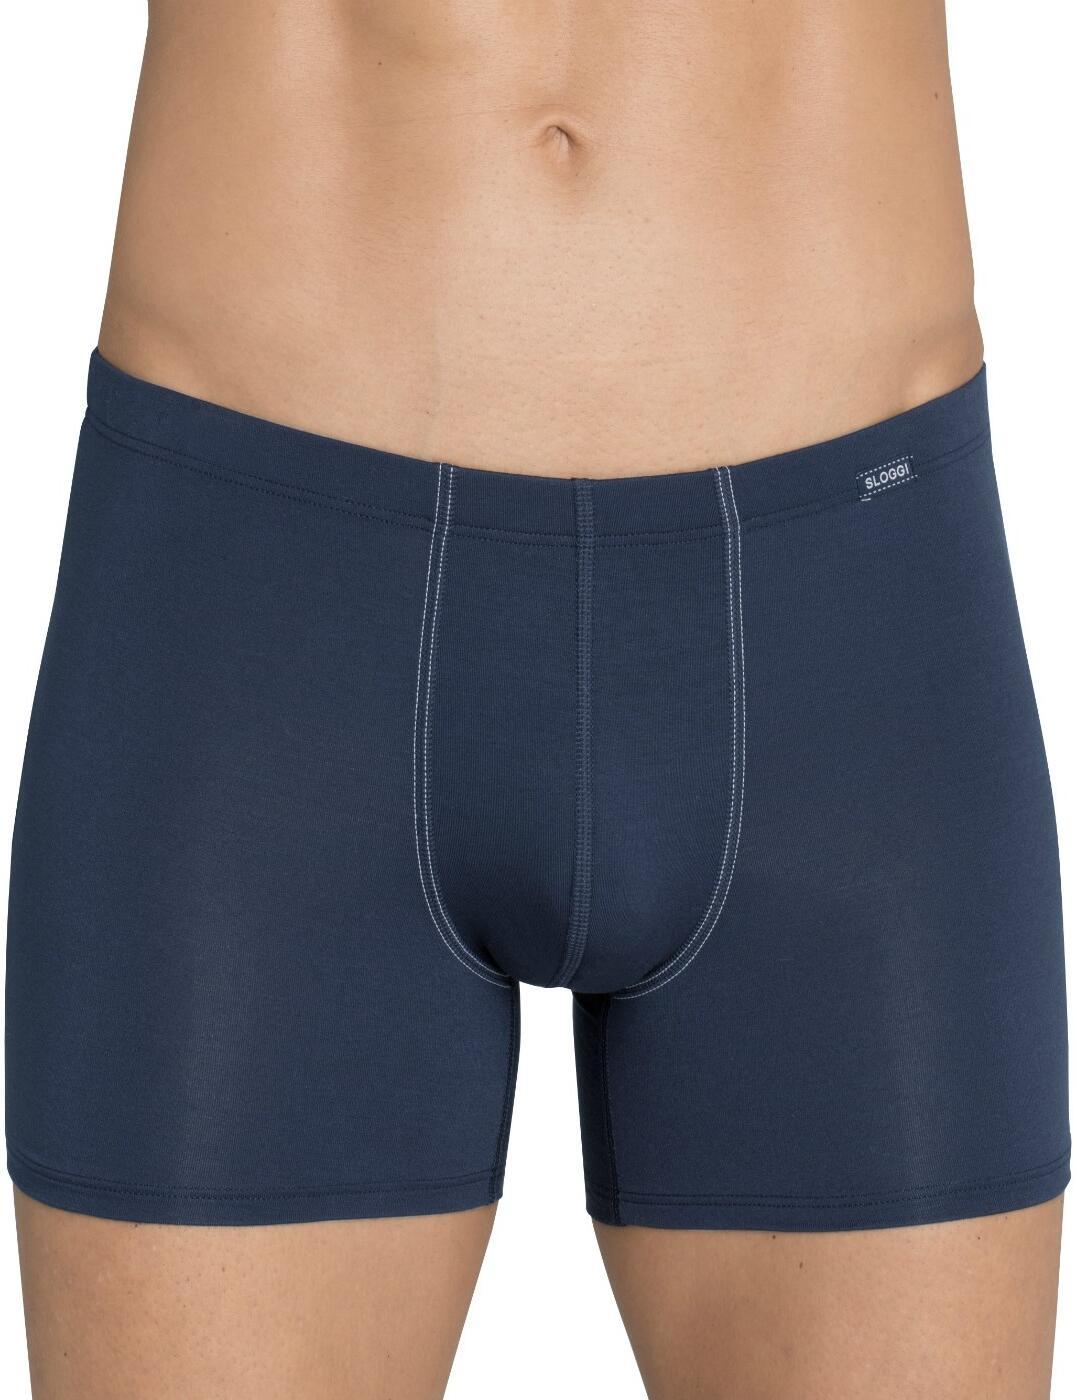 10167209 Sloggi Men Basic Soft Short - 10167209 Blue